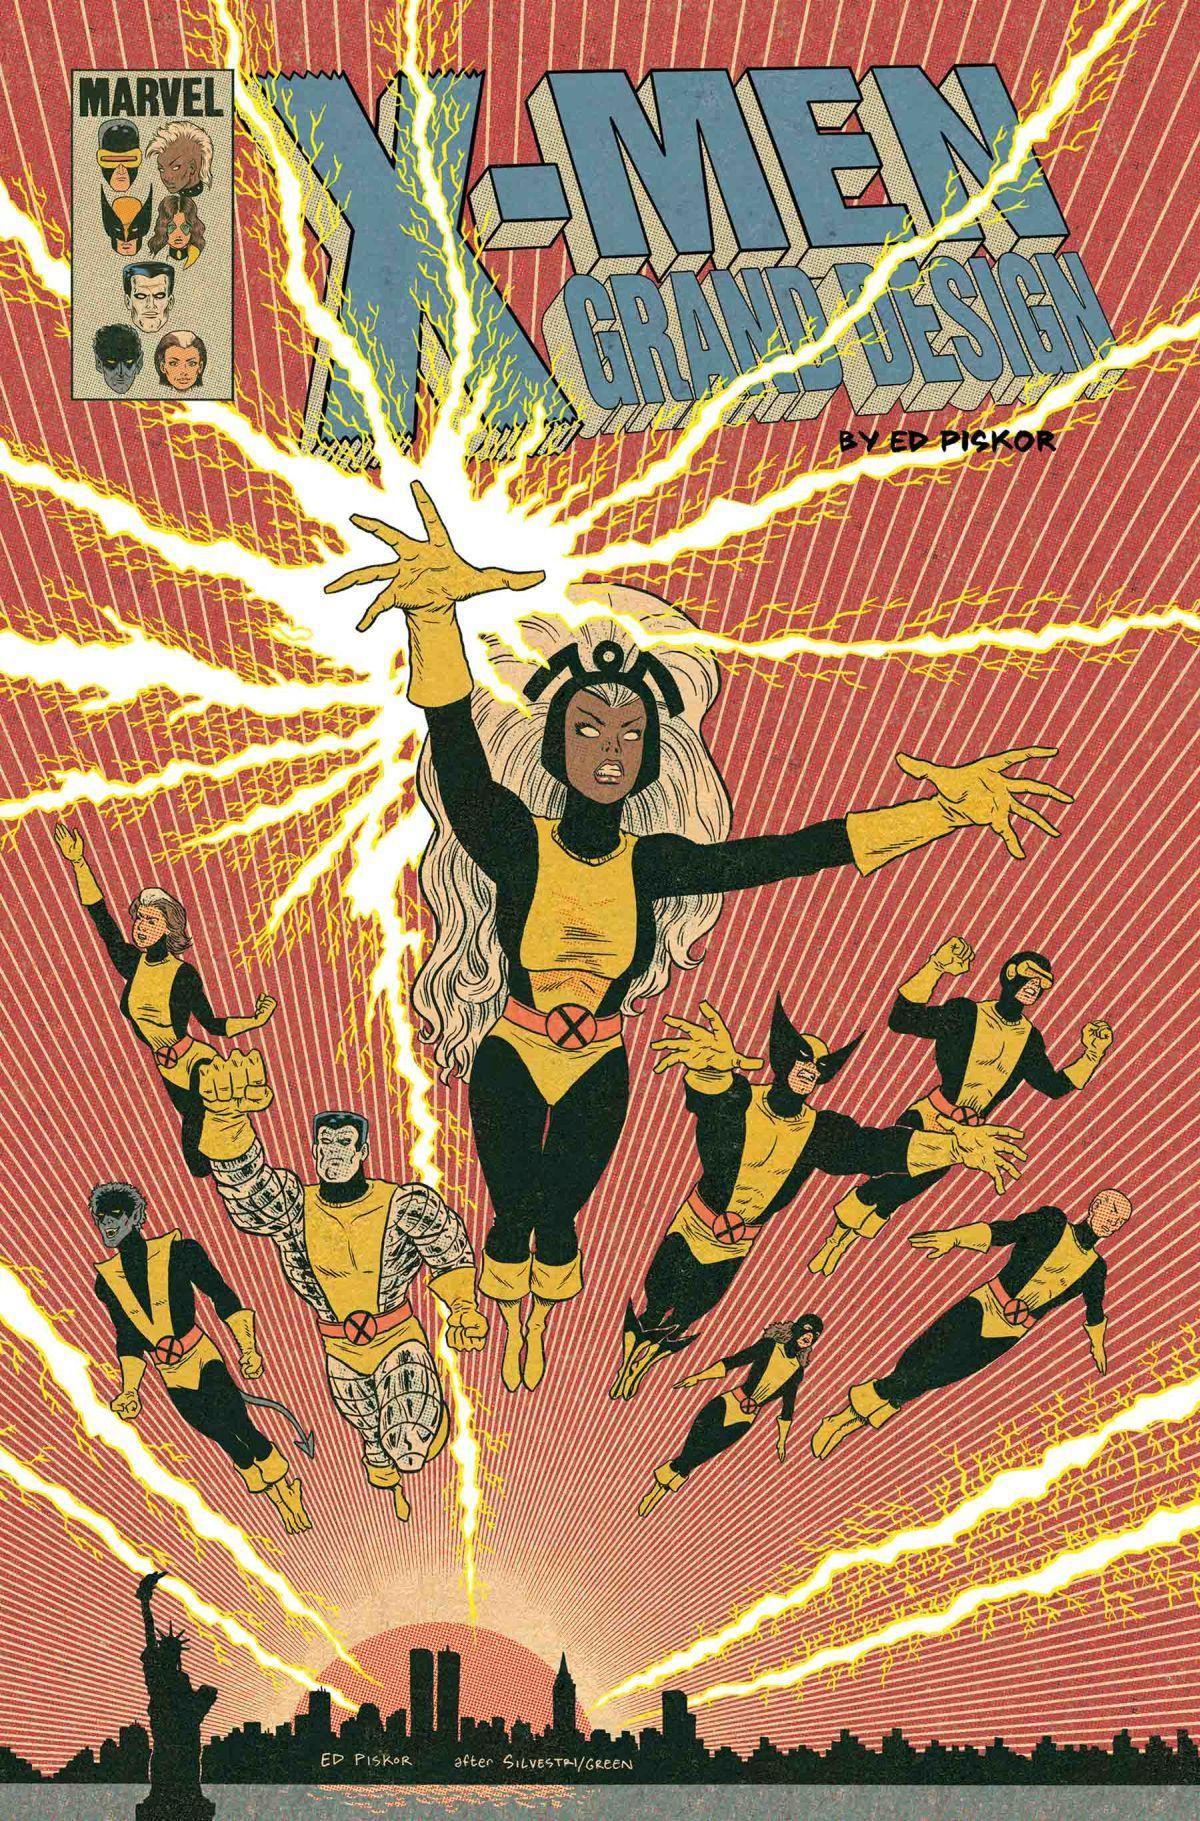 X Men Grand Design Second Genesis 2 Of 2 Variant Marvel Comics Vintage Marvel X Men